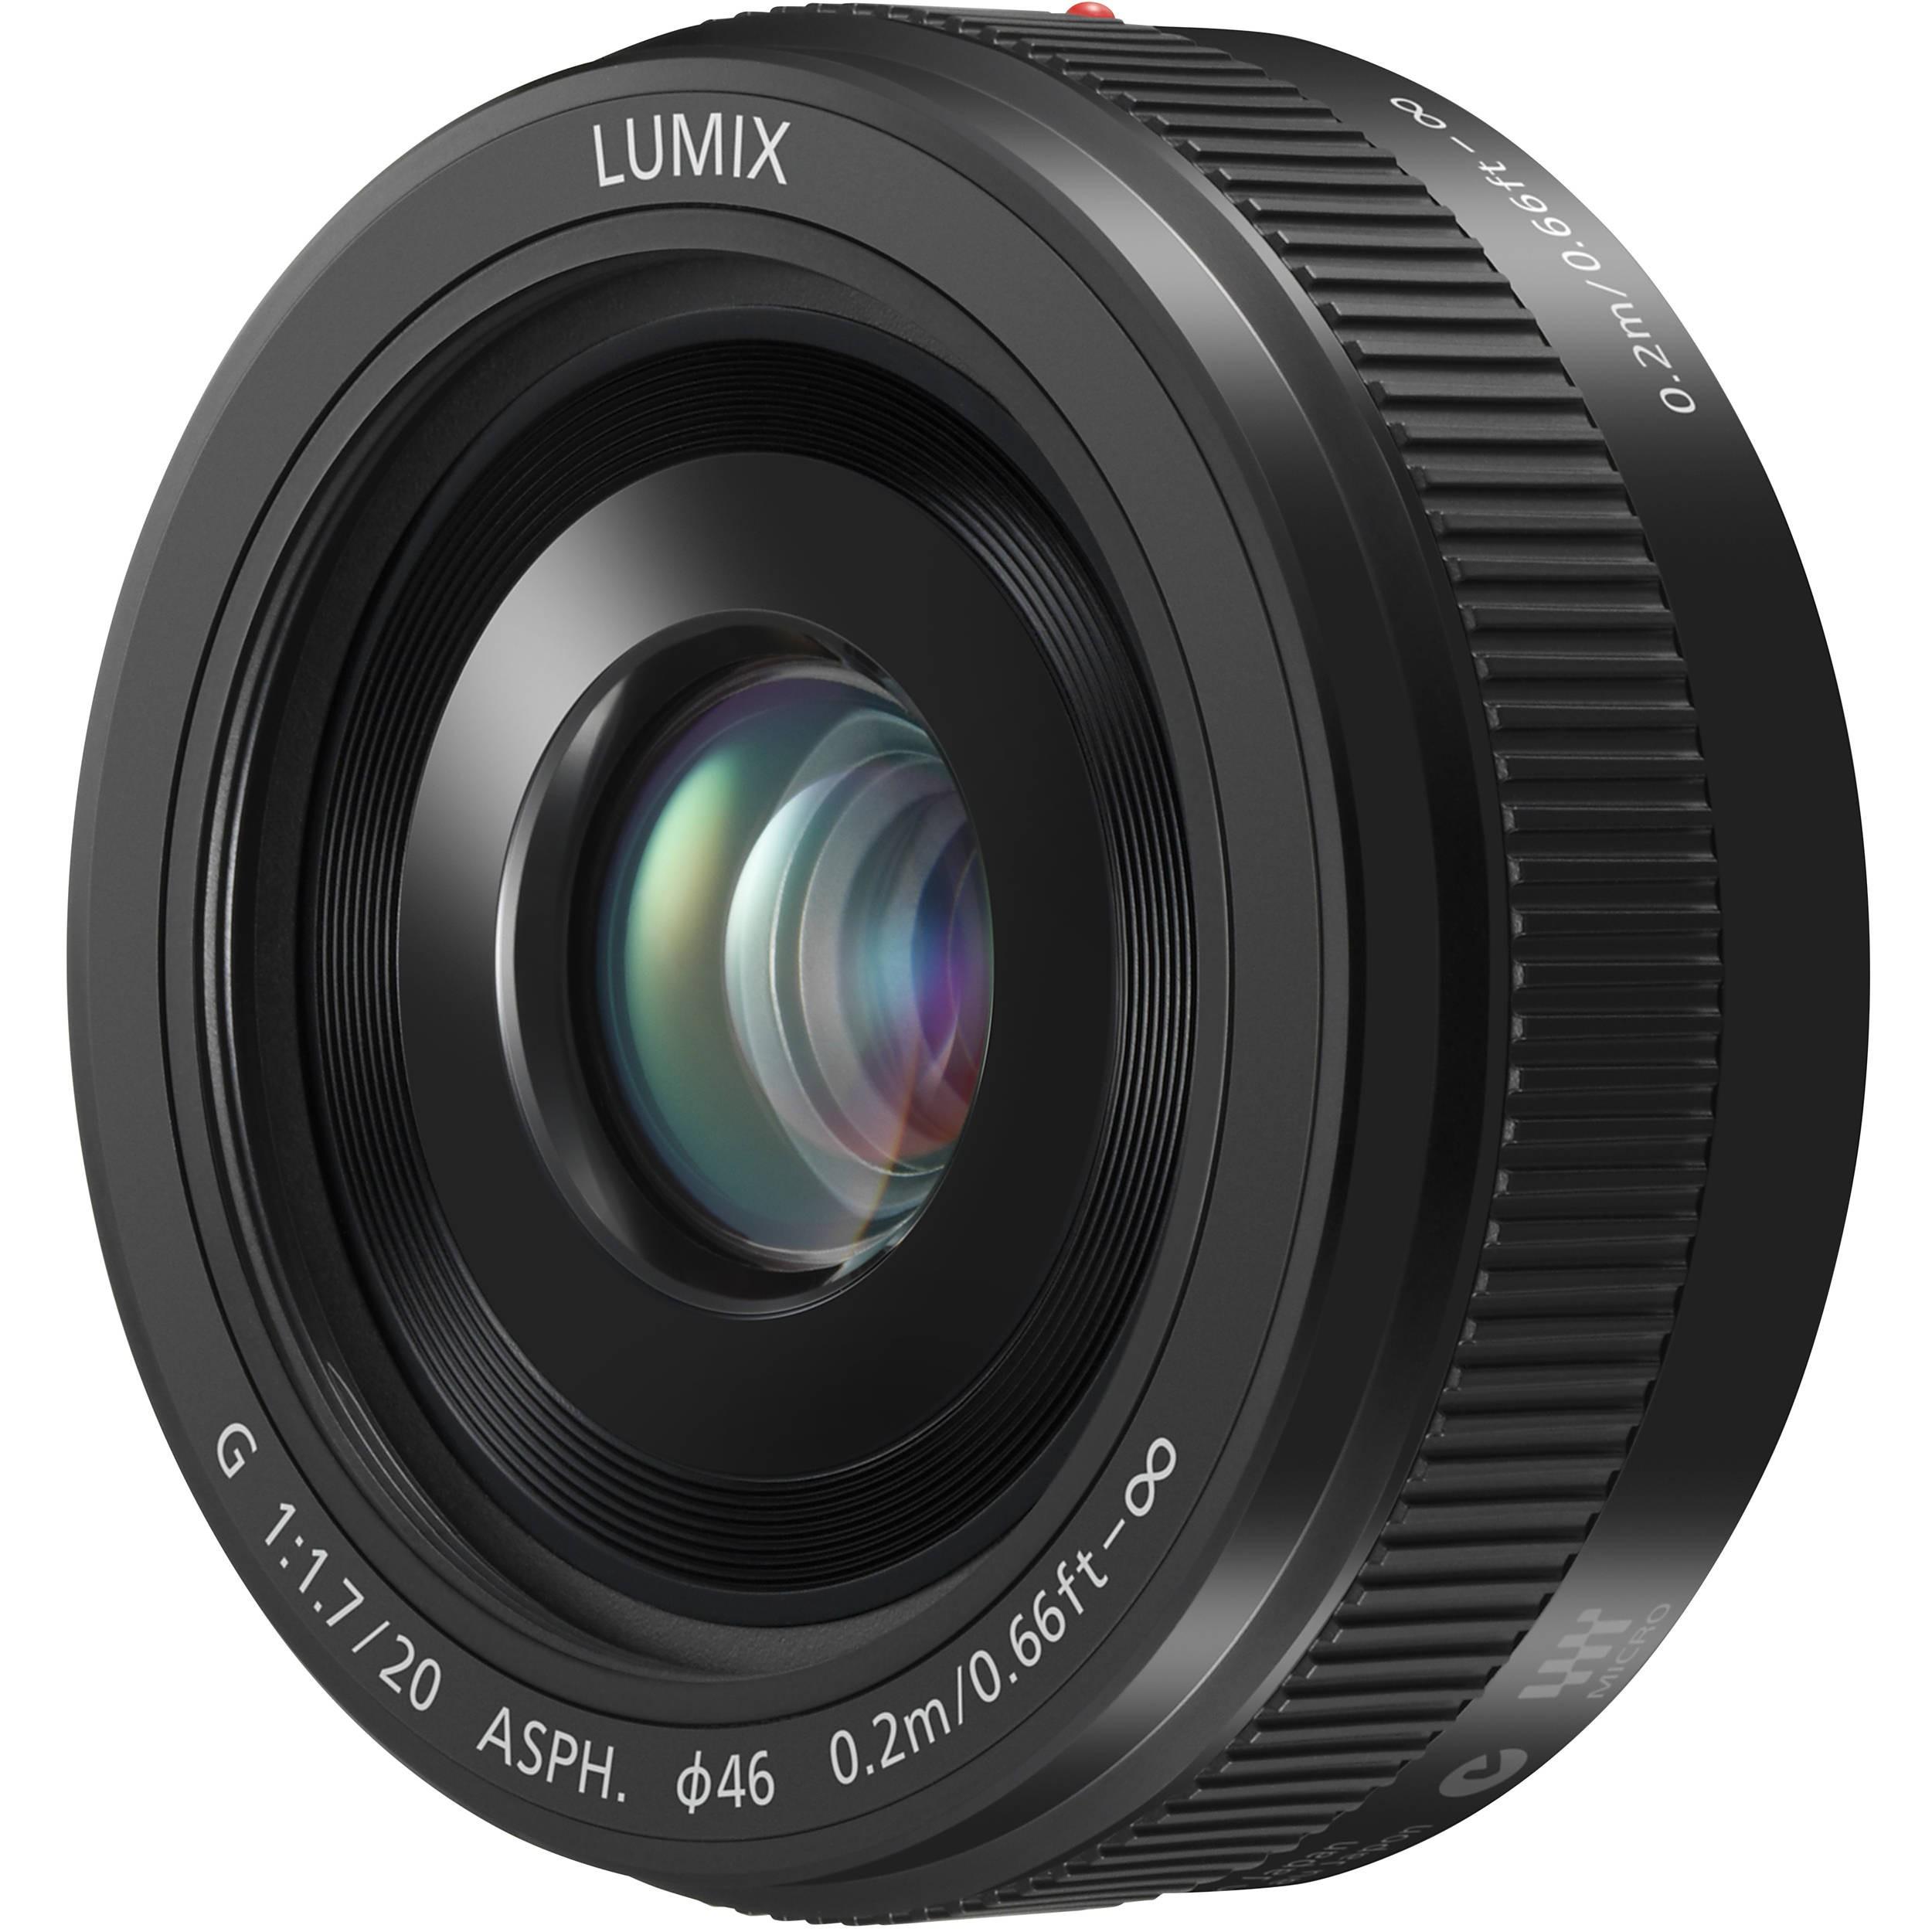 Objectif Panasonic Lumix G 20mm F/1.7 II ASPH - Noir, Monture micro 4/3